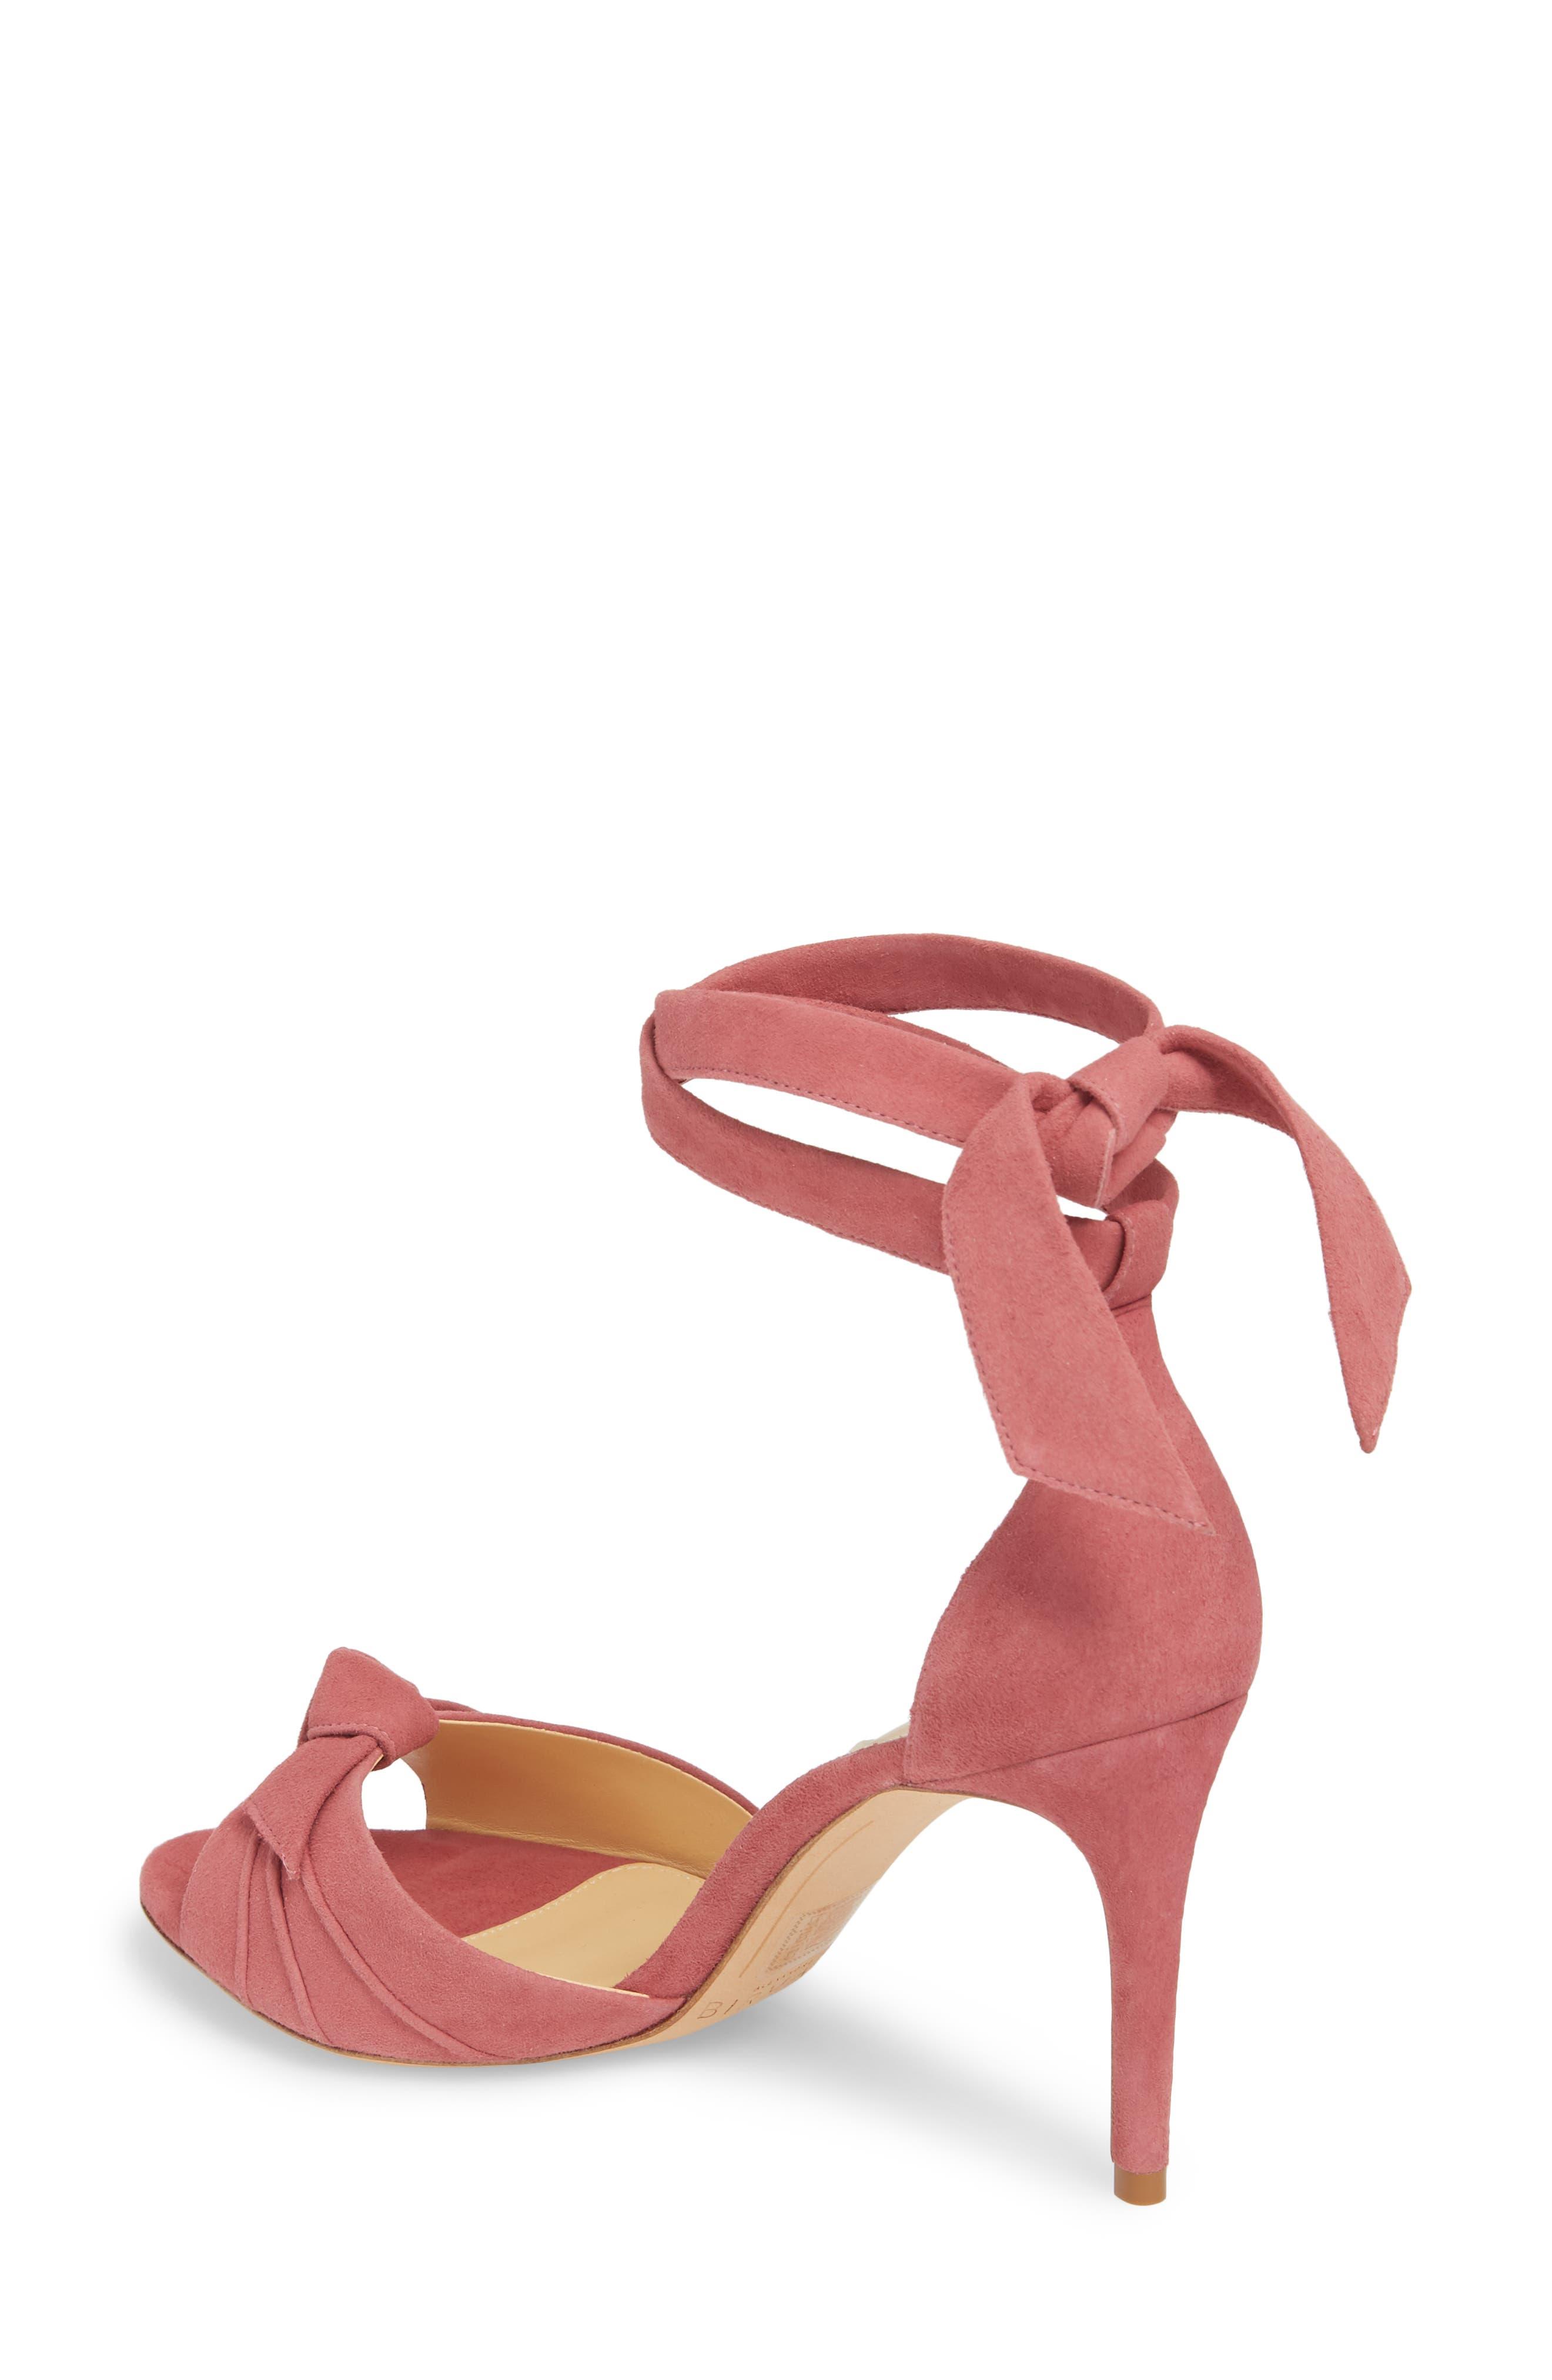 Clarita Ankle Tie Sandal,                             Alternate thumbnail 2, color,                             Dusty Rose